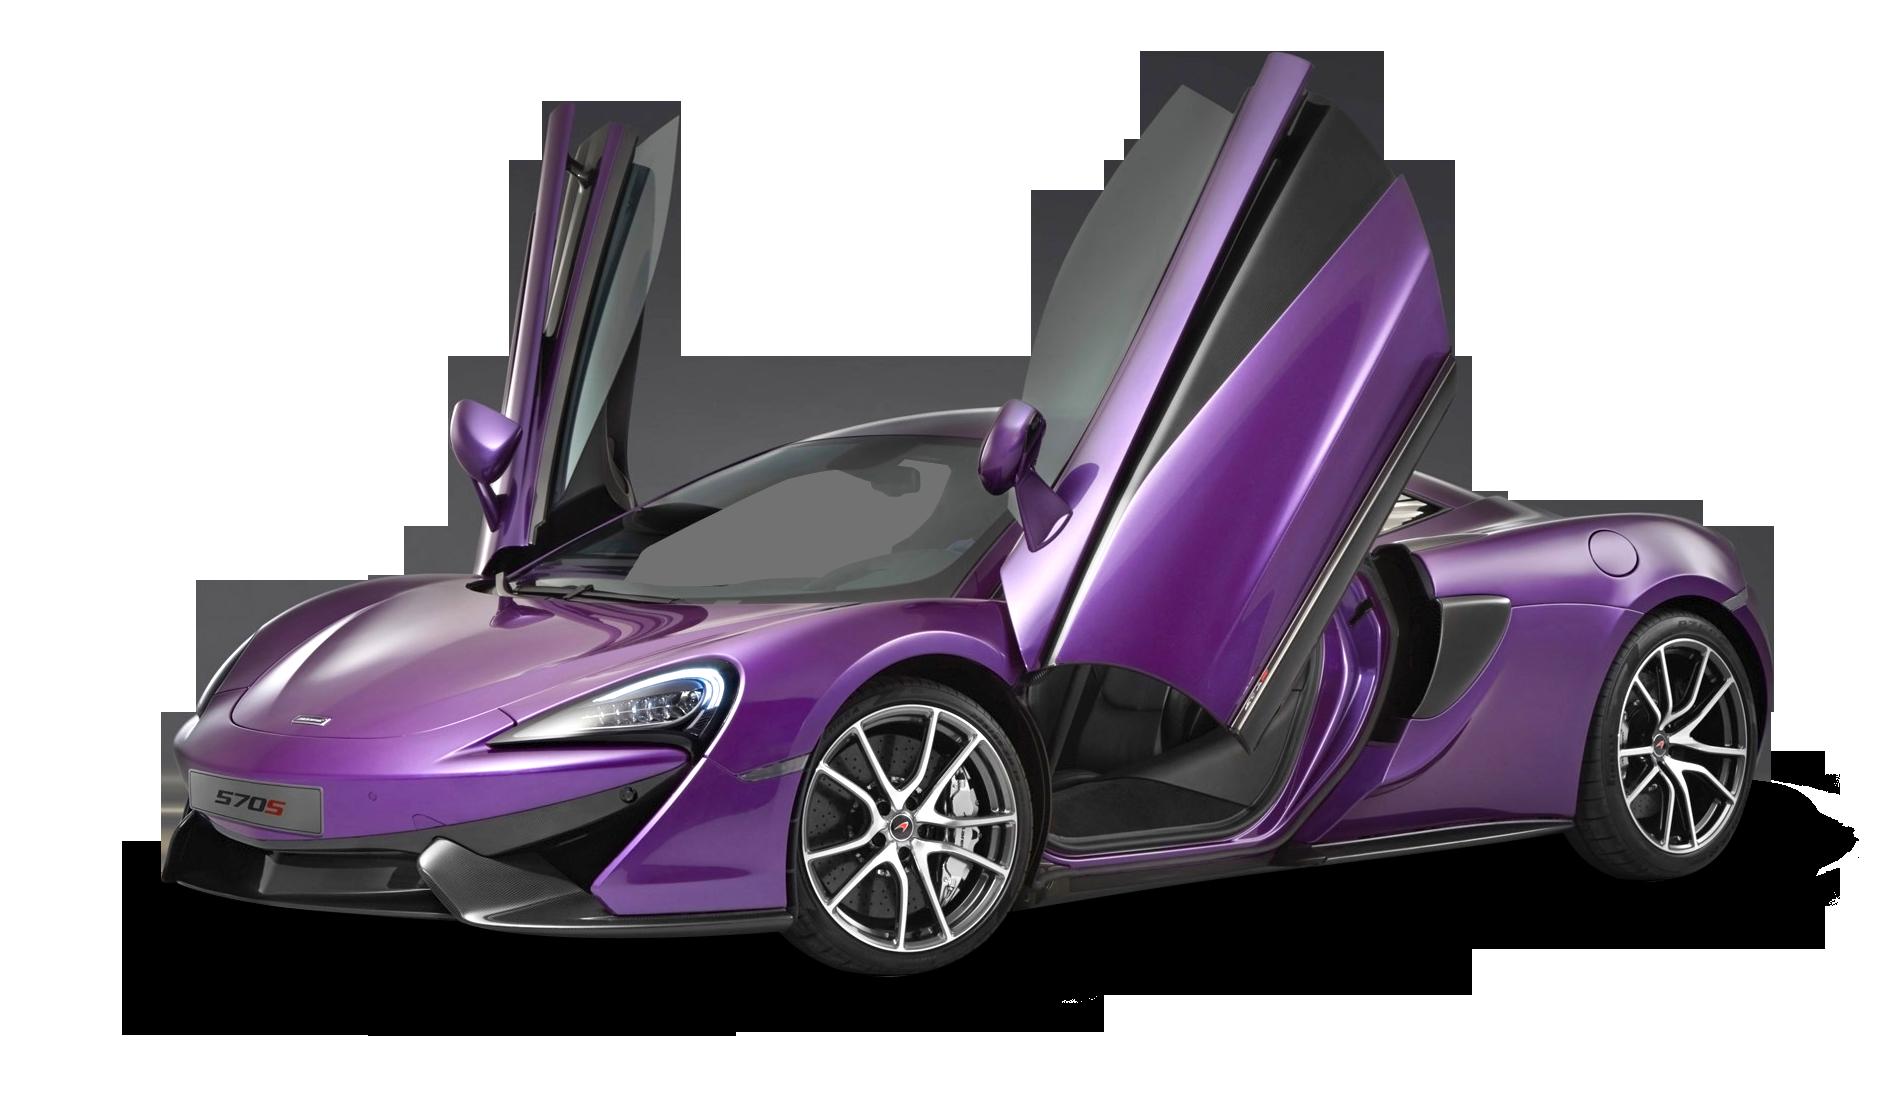 Violet Mclaren 570s Car Png Image Mclaren 570s Car Mclaren